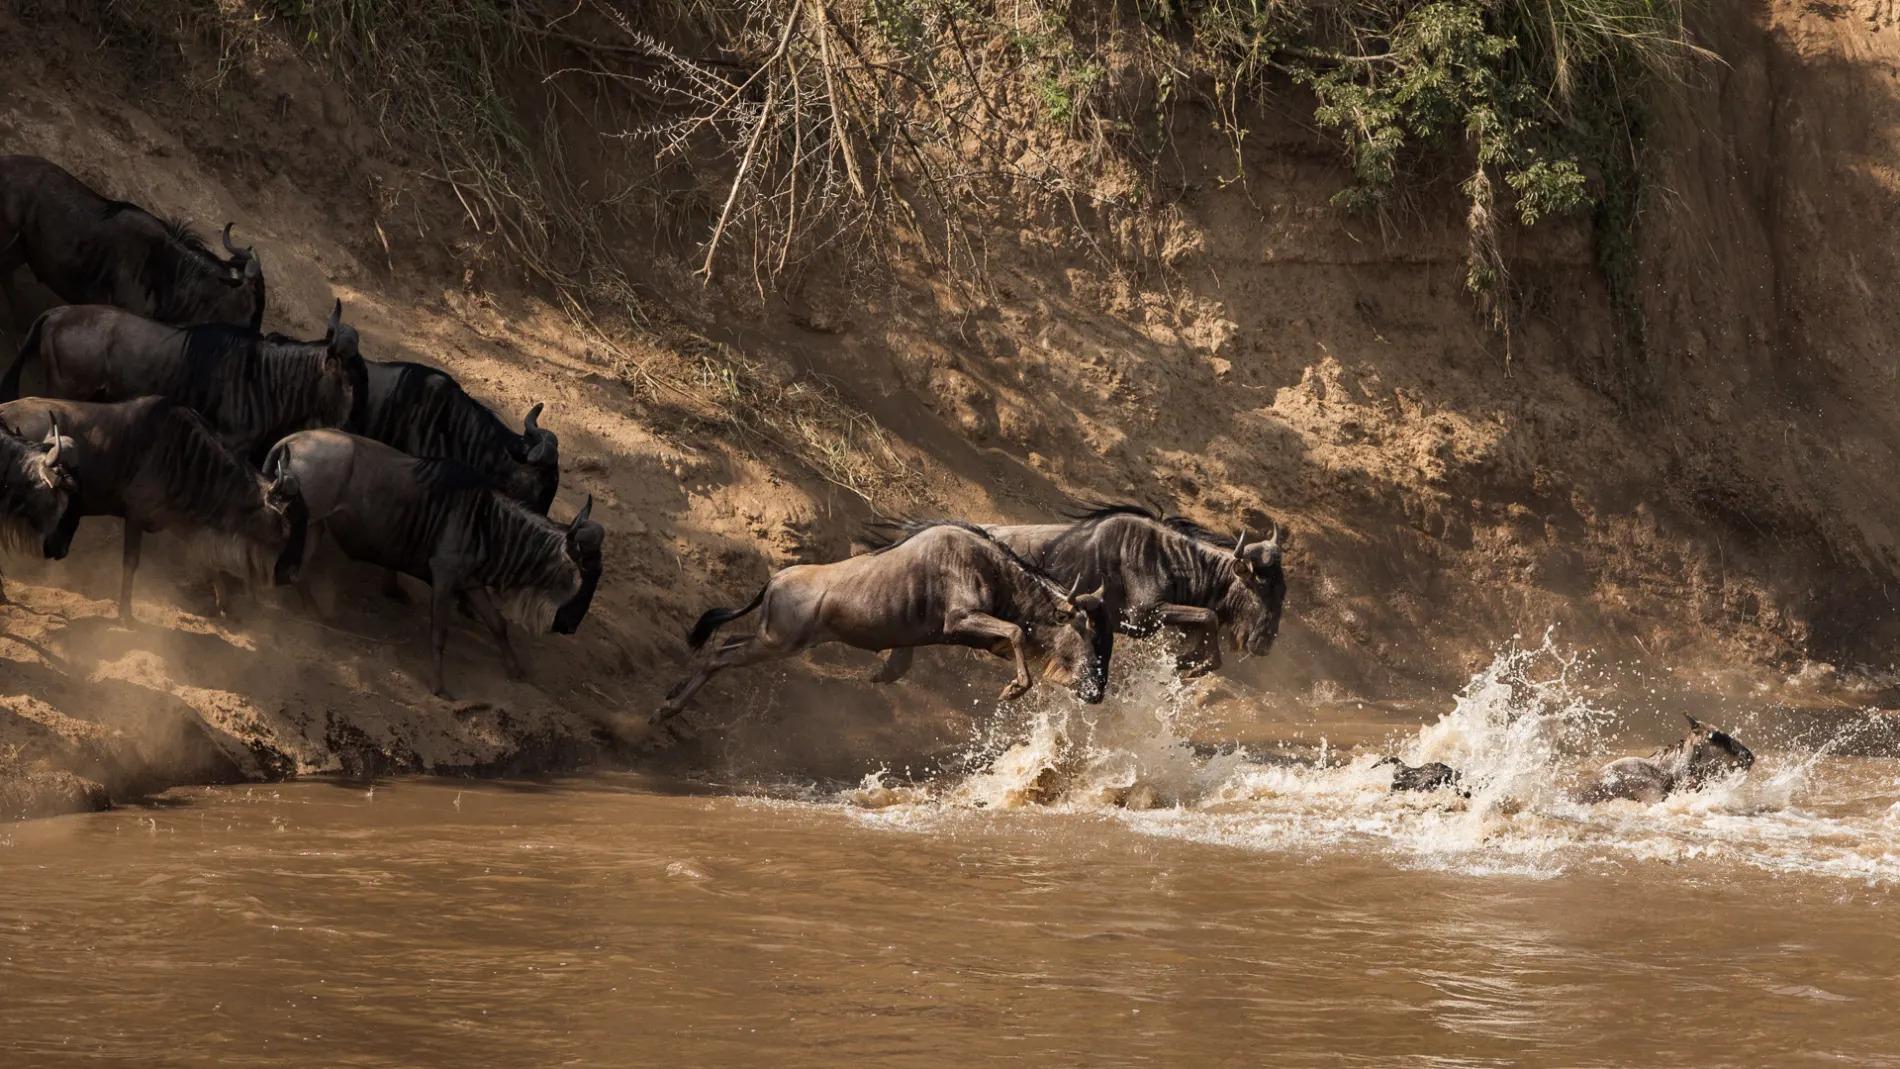 Mara river crossing 2